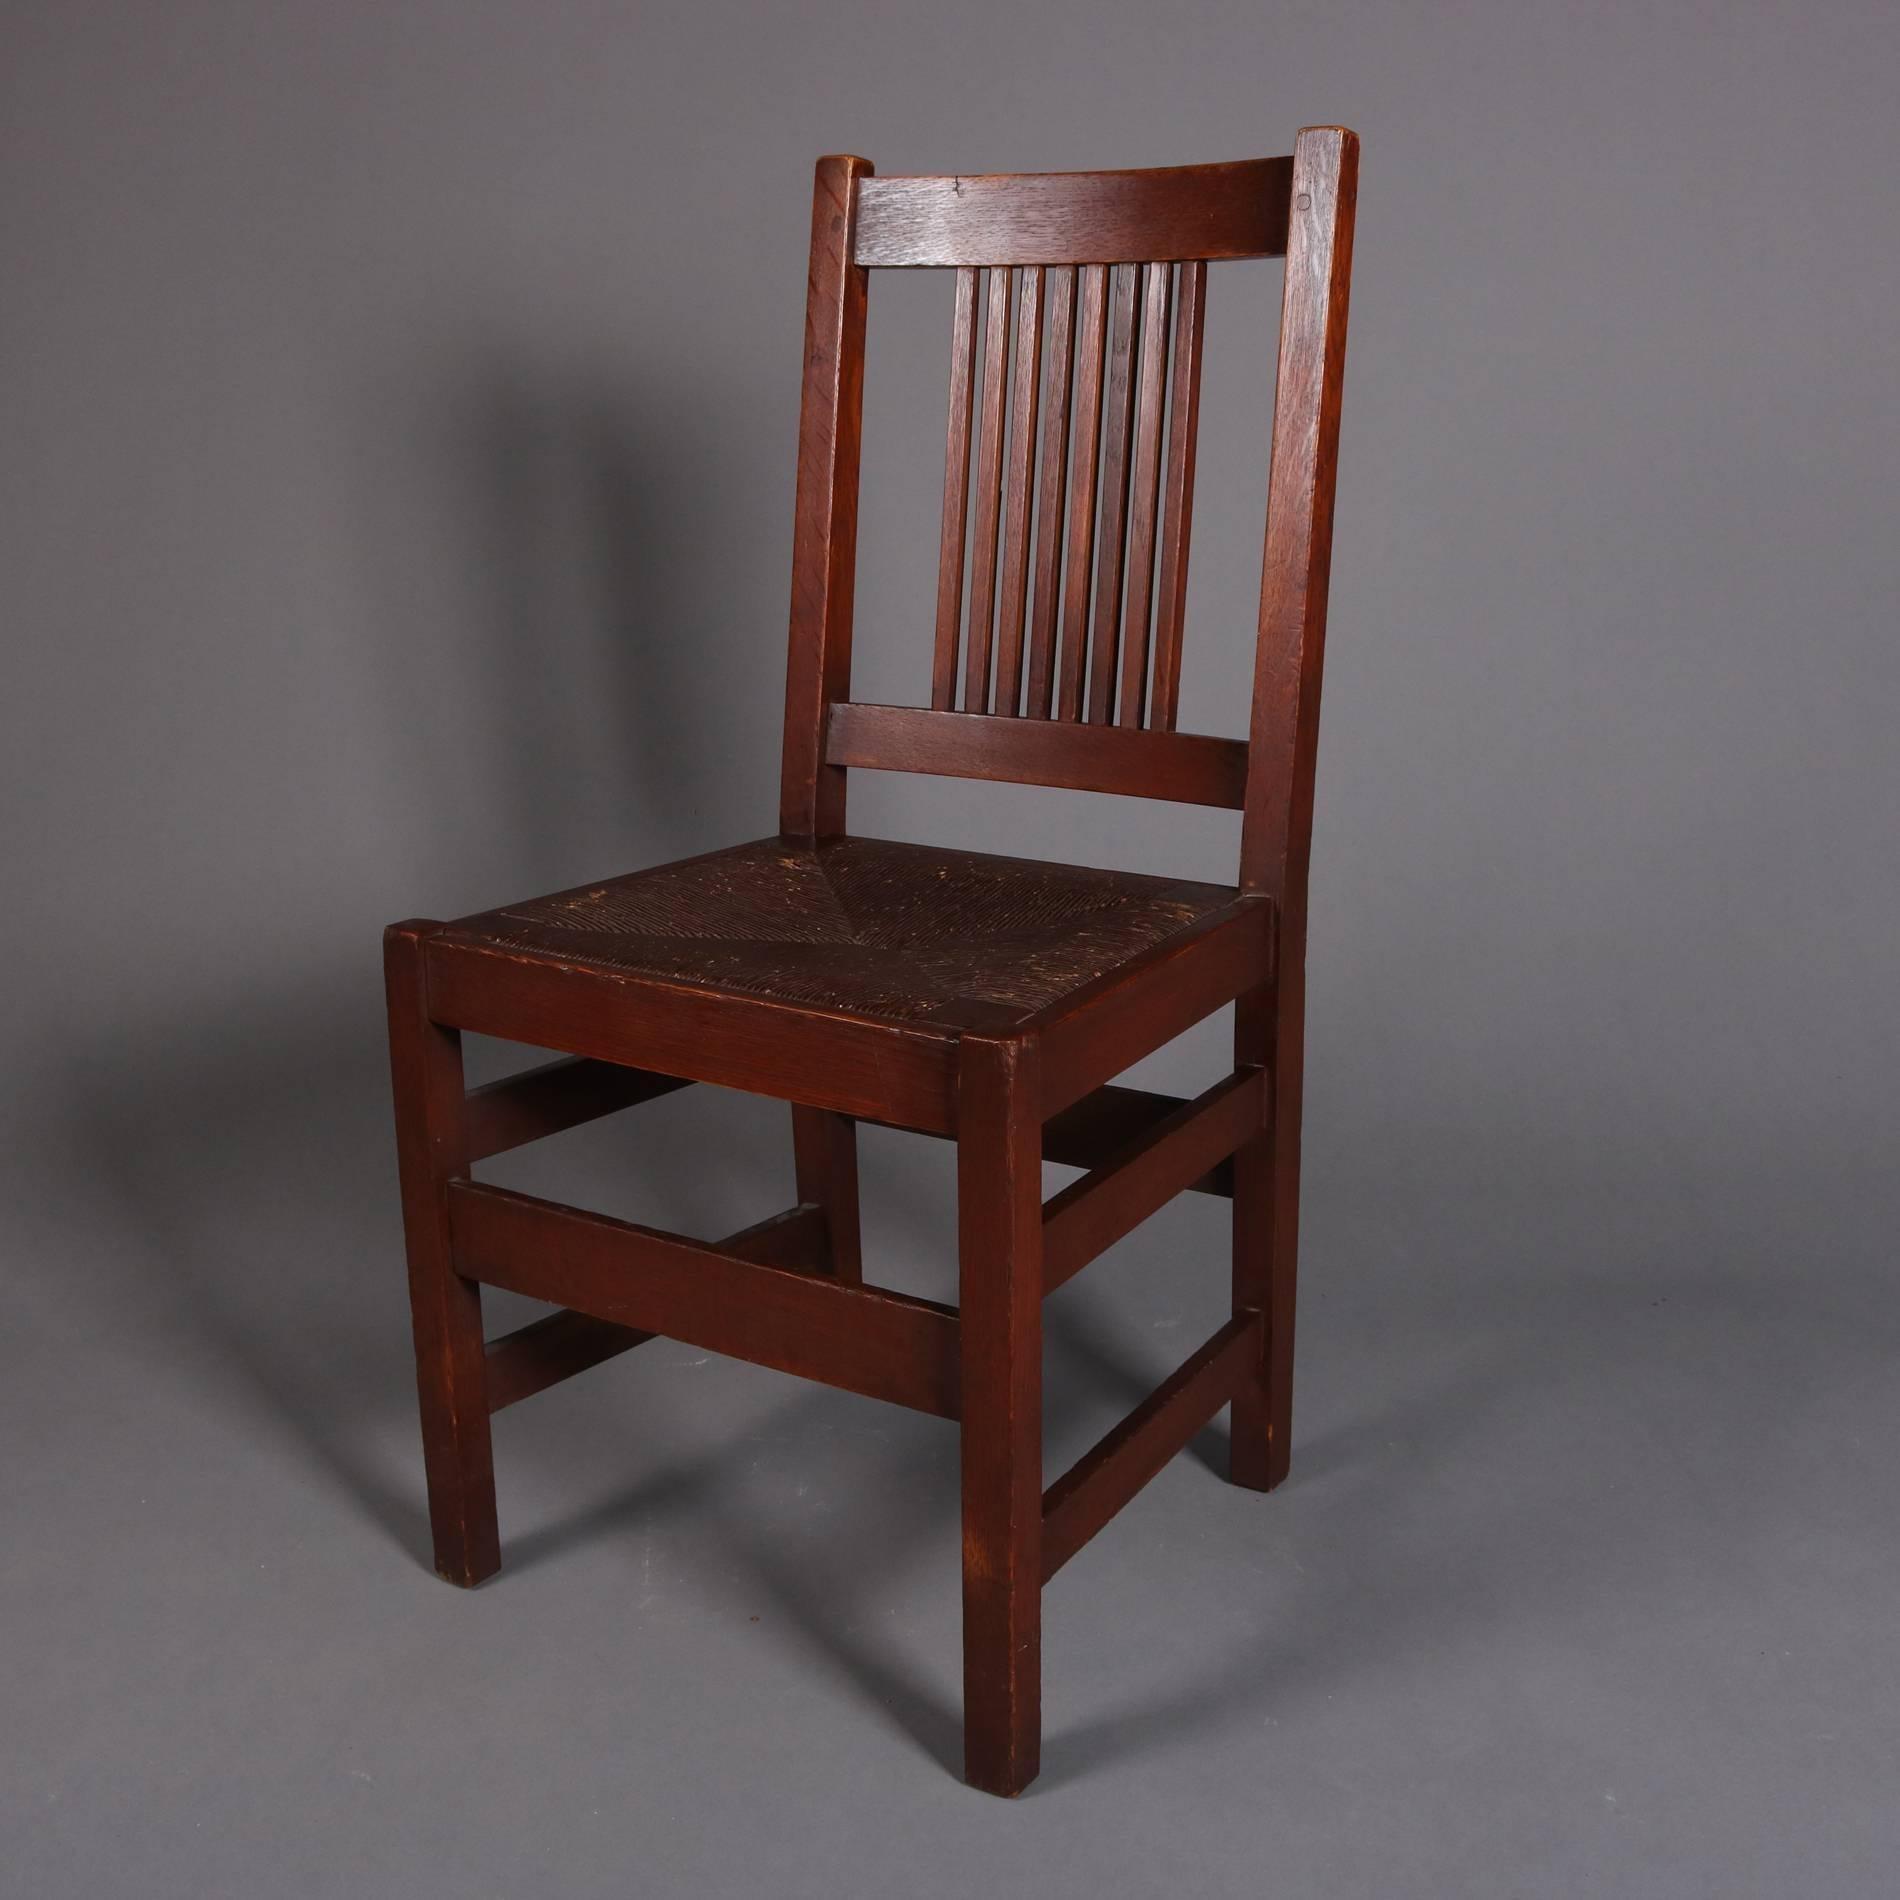 Four Antique Arts U0026 Crafts Mission Oak Chairs By L. U0026 J. G. Stickley  Feature Spindle